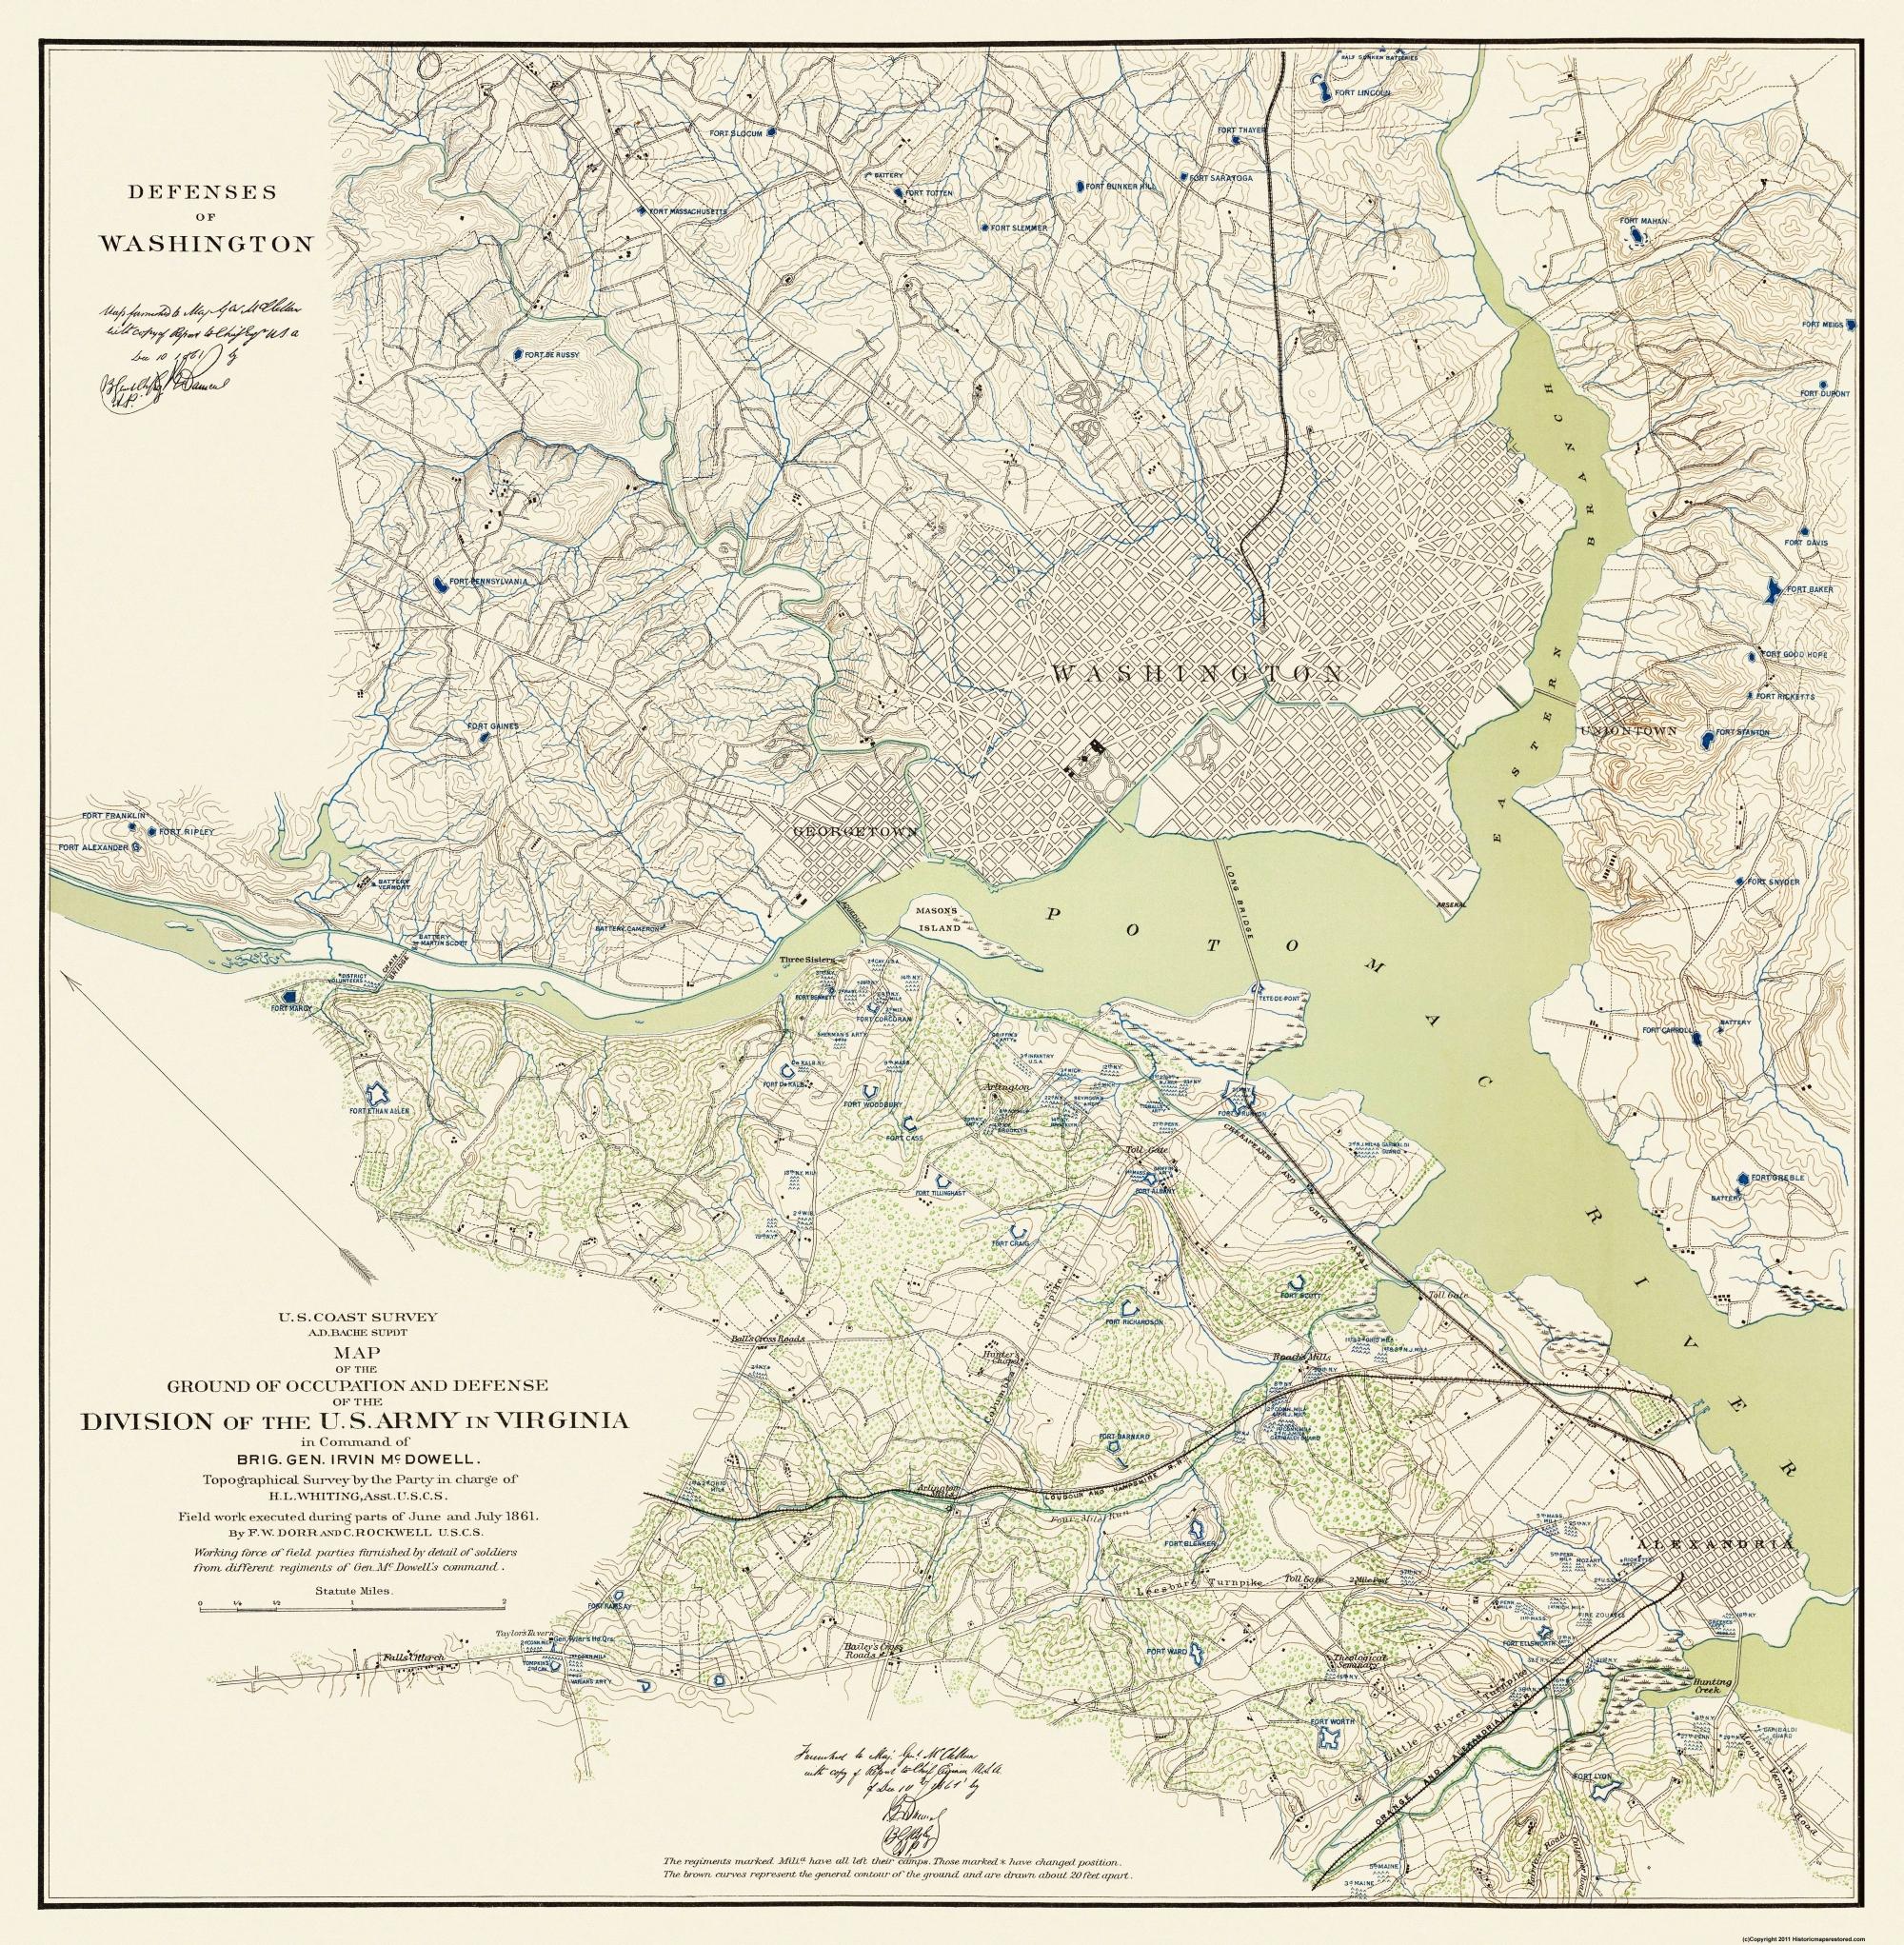 Civil War Map Print - Washington DC Defenses - 1861 - 23 x 23.5